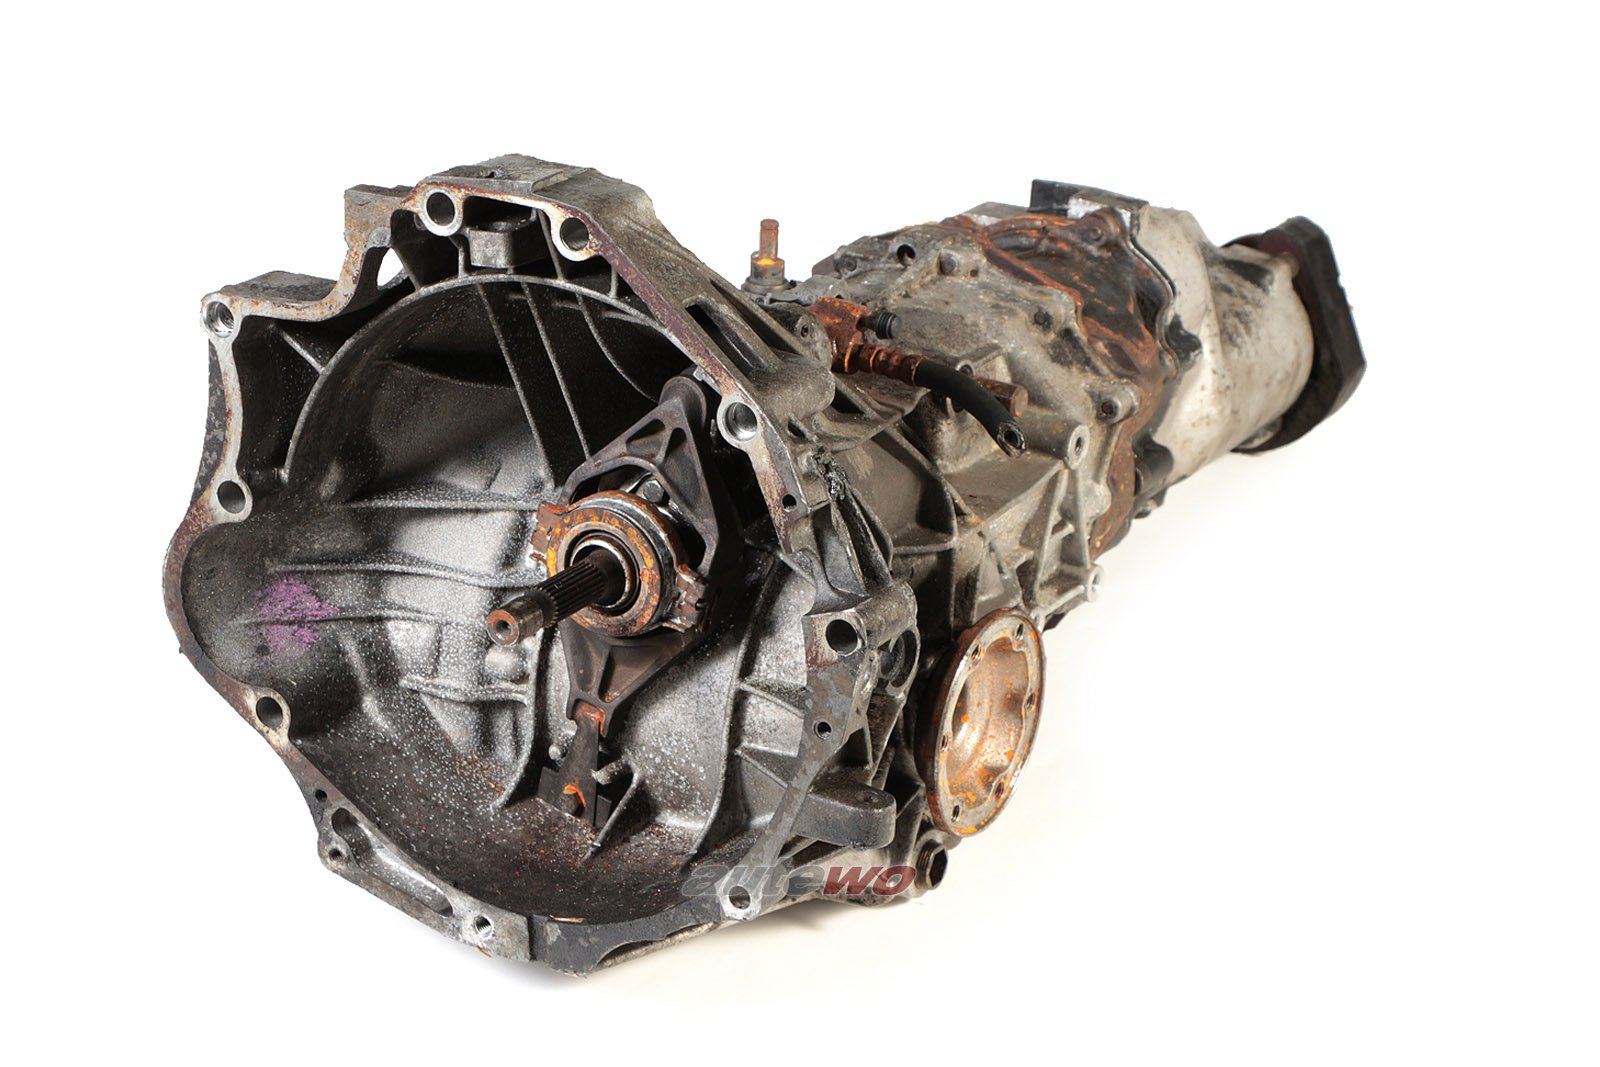 016300046K Audi 100 44 5 Zyl Getriebe quattro AAH 07116 151000km